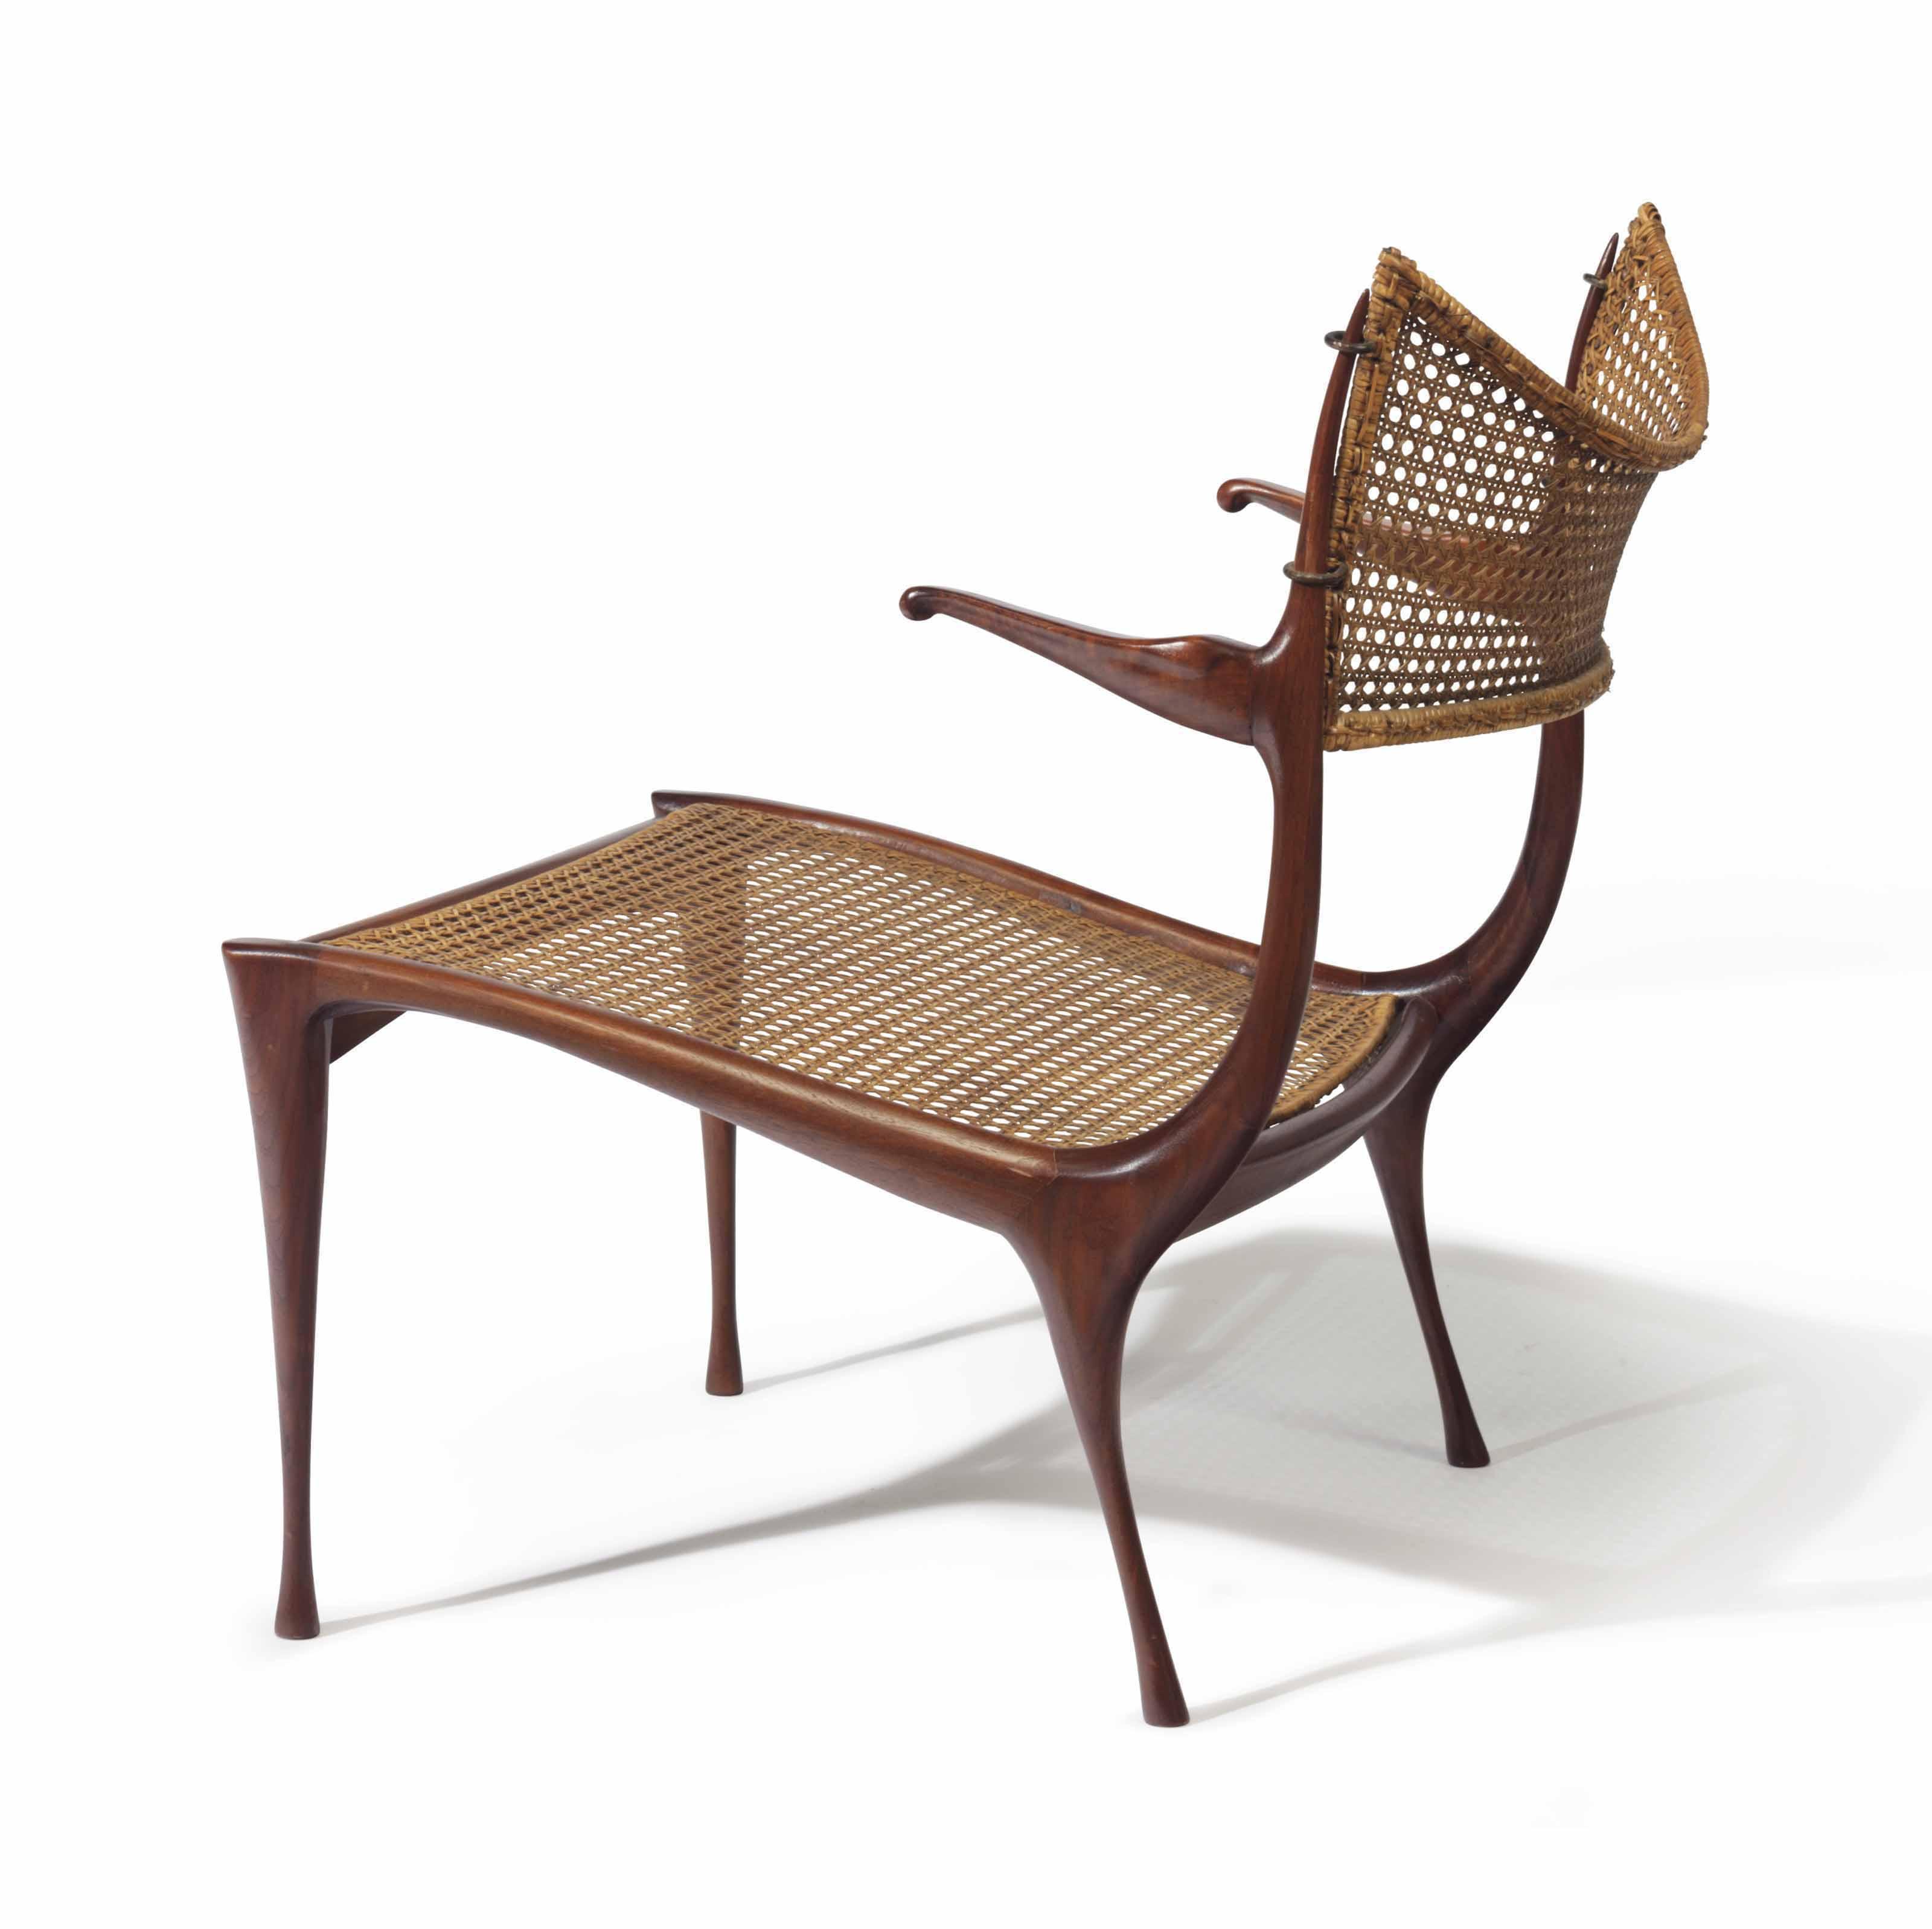 Exceptionnel Dan Johnson (1918 1979), A Gazelle Lounge Chair, Circa 1958.